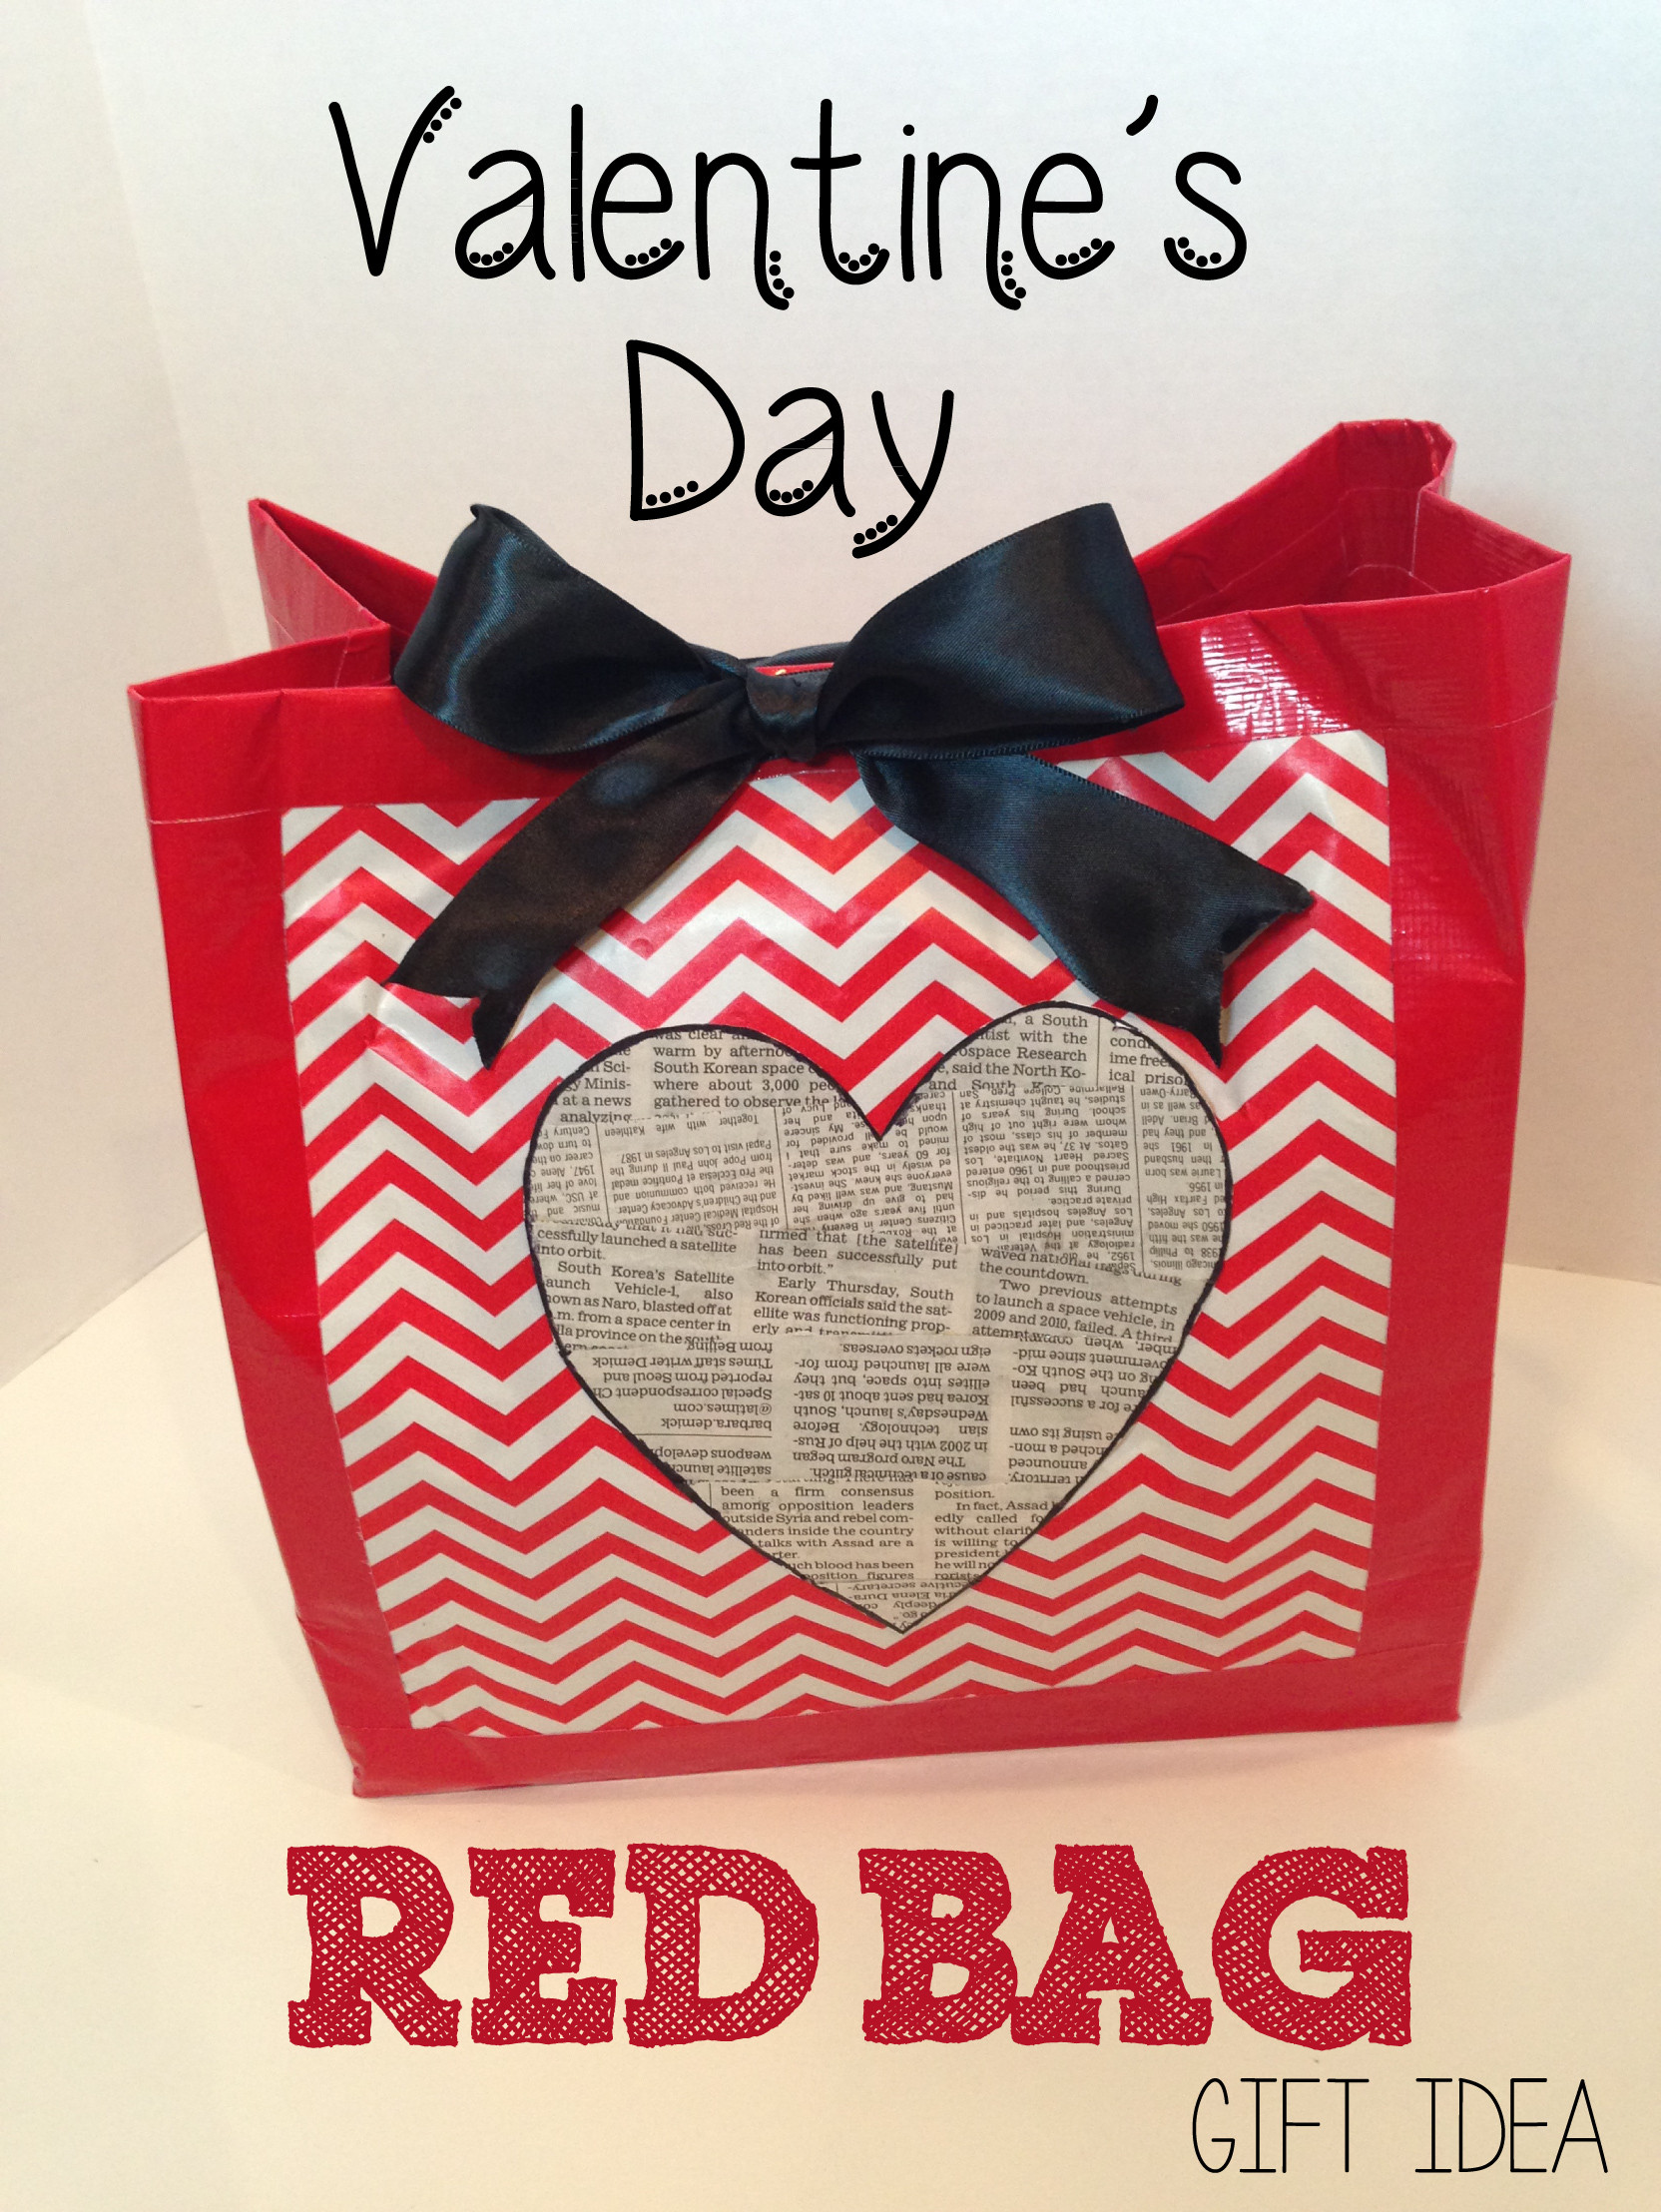 Valentines Gift Bag Ideas  Creative Blog Home Organization DIY Crafts